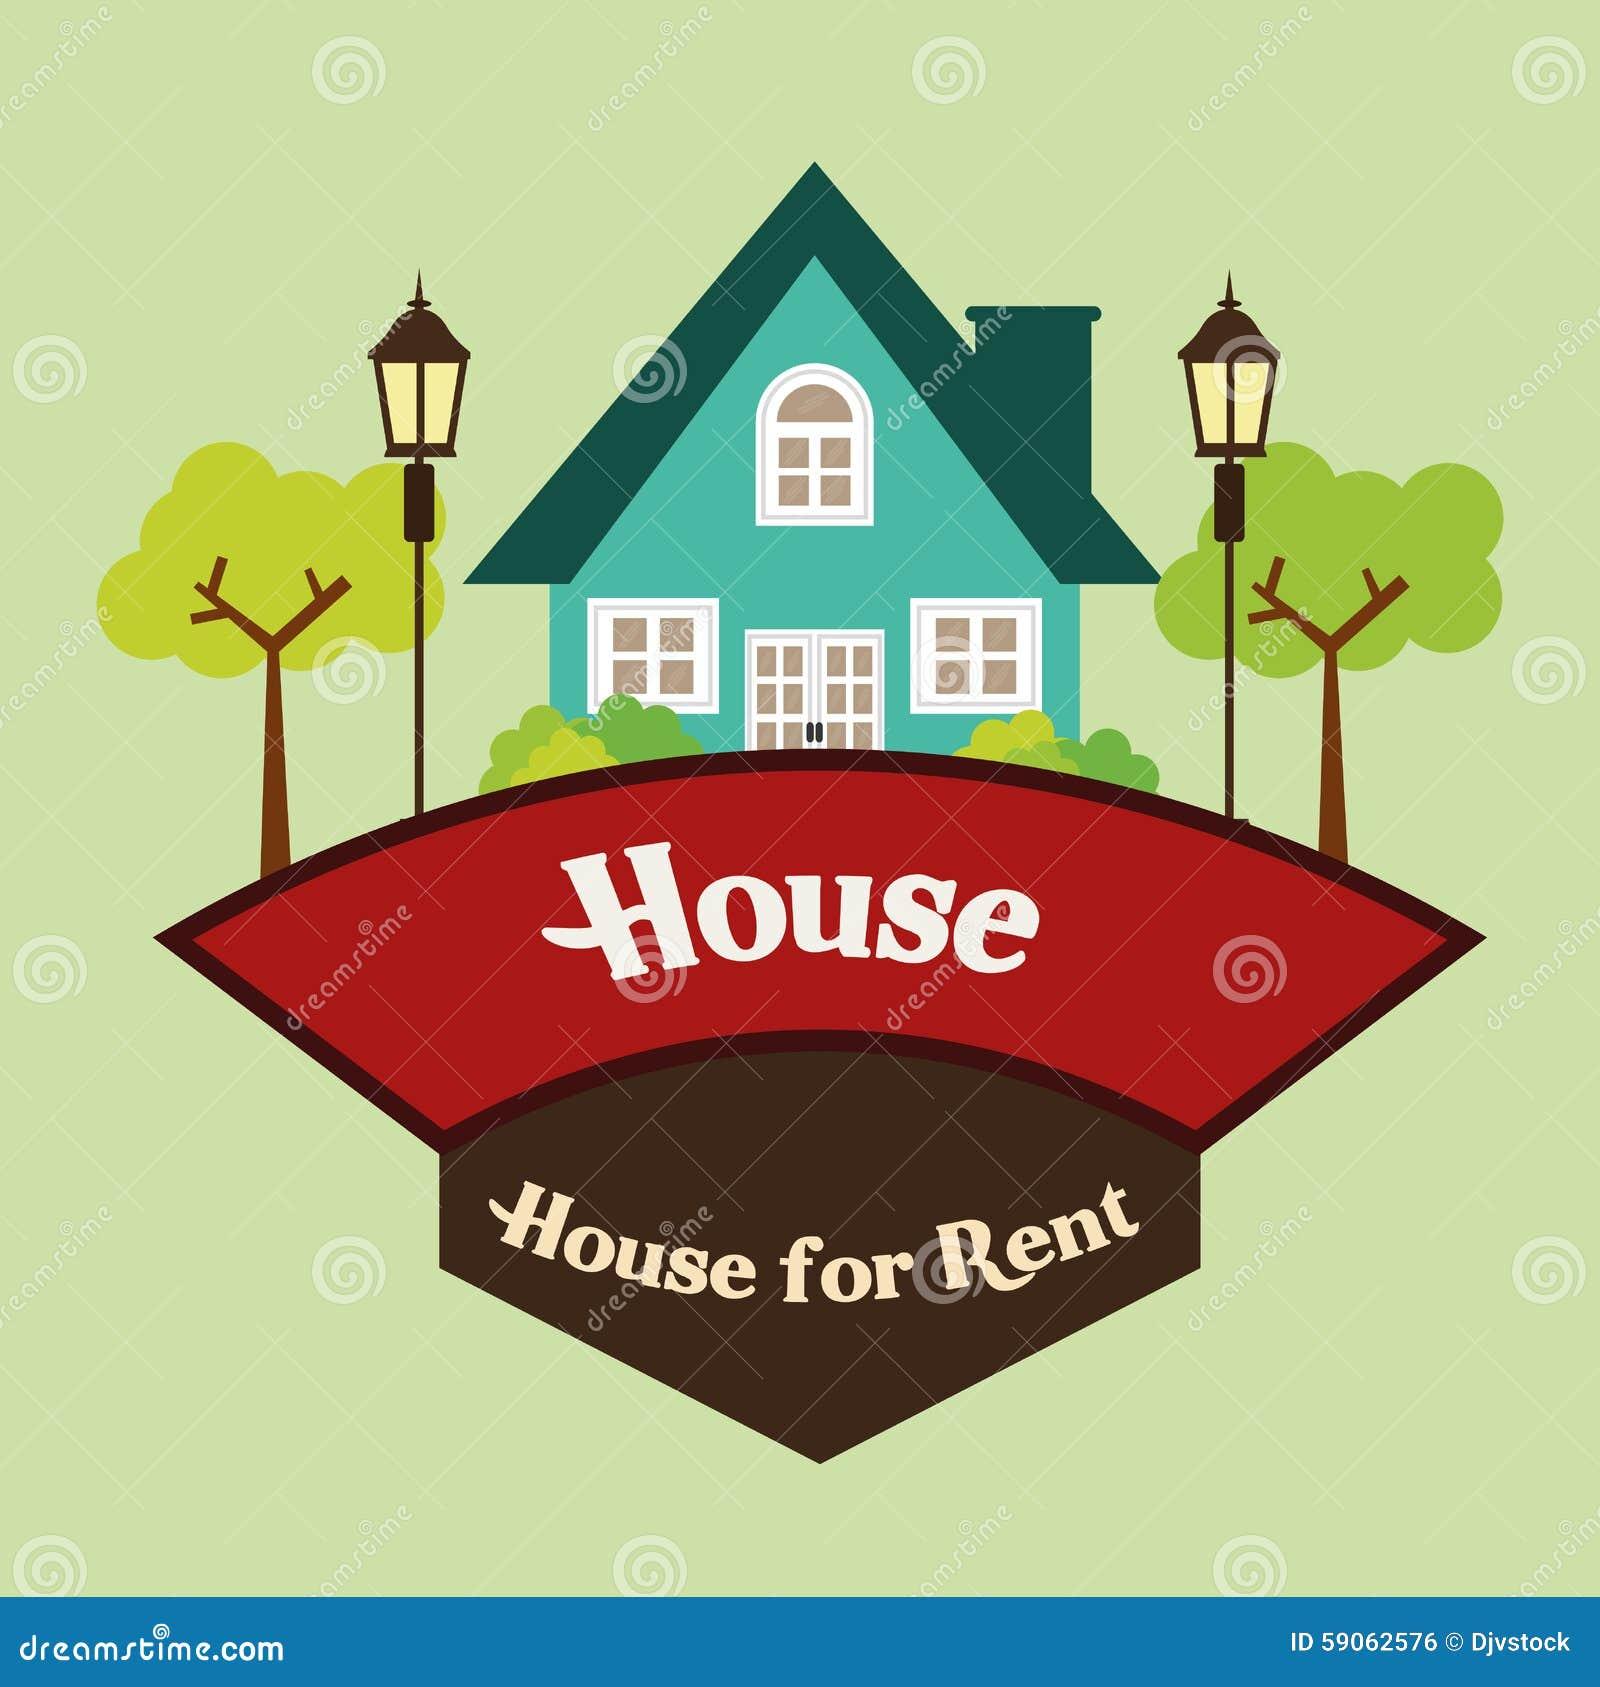 House design stock vector image 59062576 for Digital house design